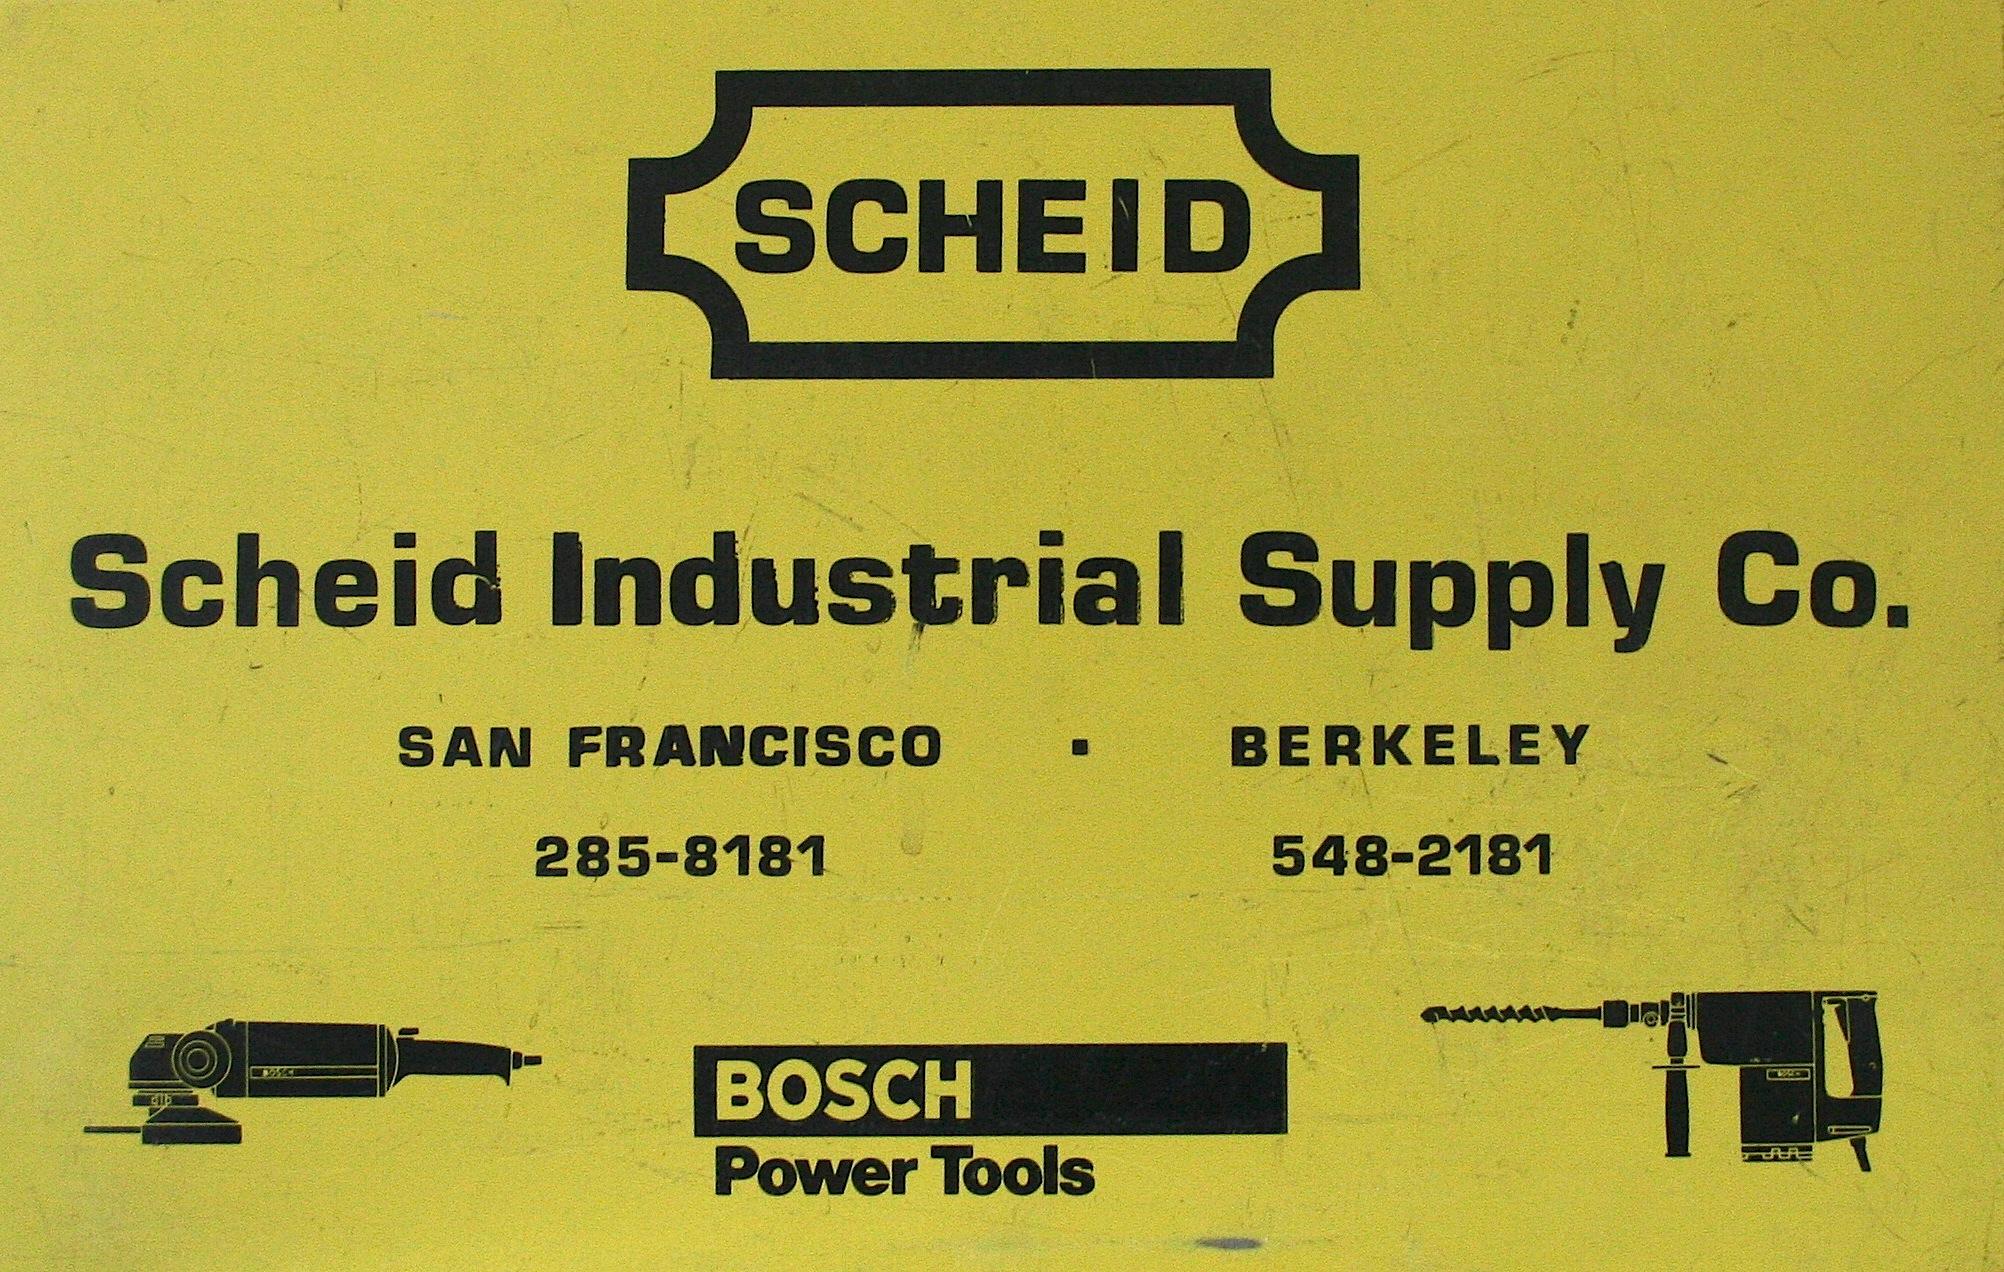 Original Tool Box from Scheid Industrial